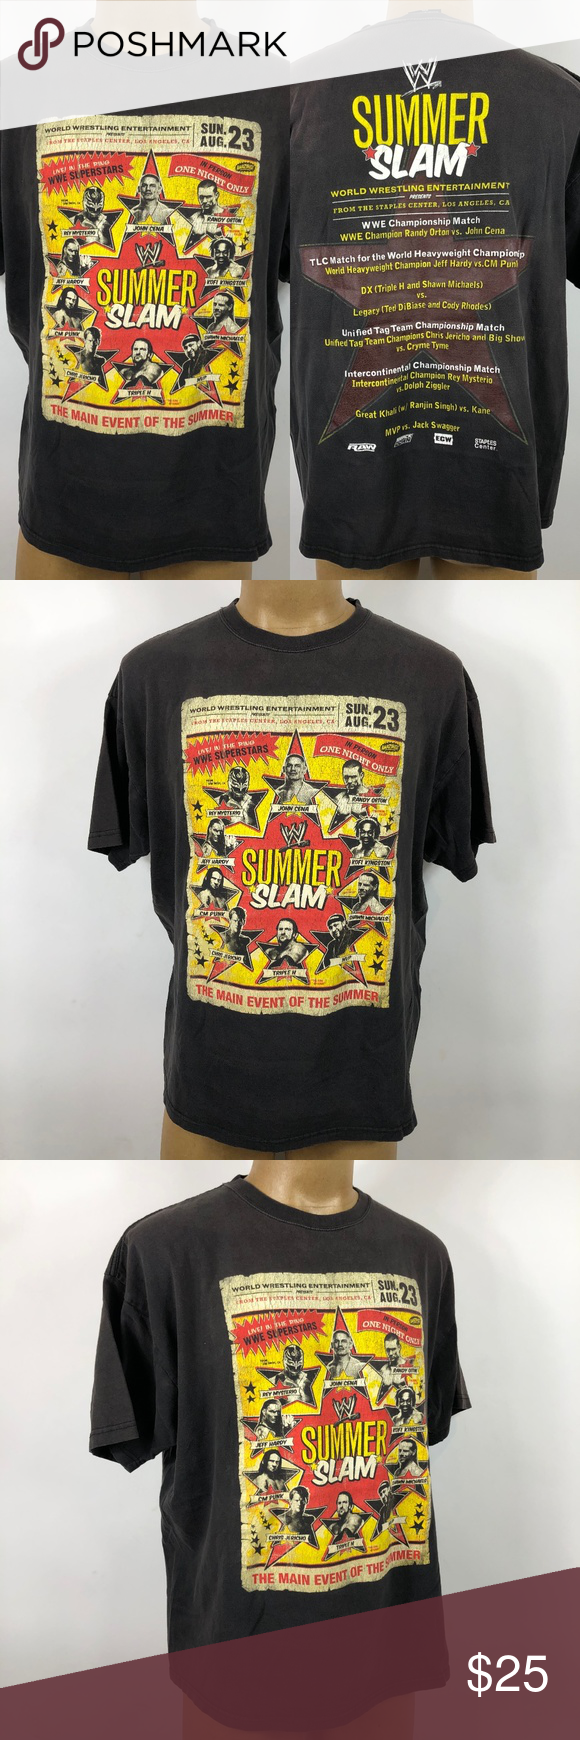 Rare Wwe Summer Slam 2010 John Cena Tshirt 2xl Wwe Shirts Shirt Length Clothing Items